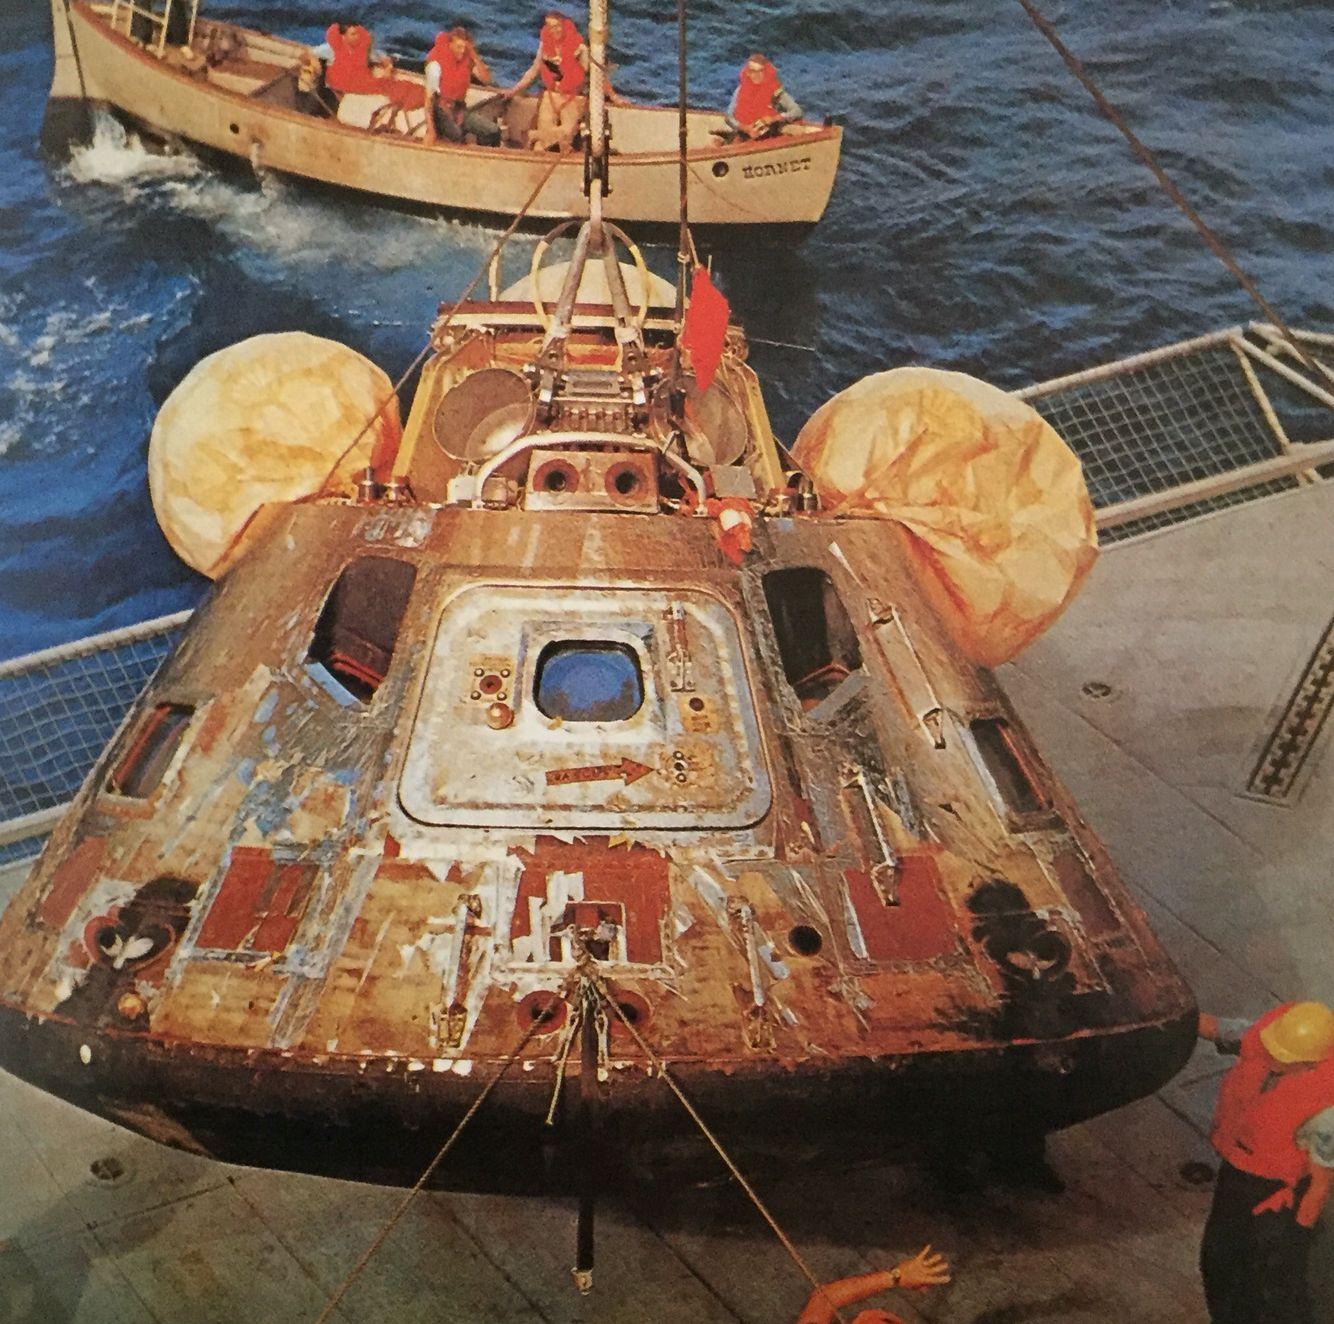 apollo 11 mission space race - photo #48